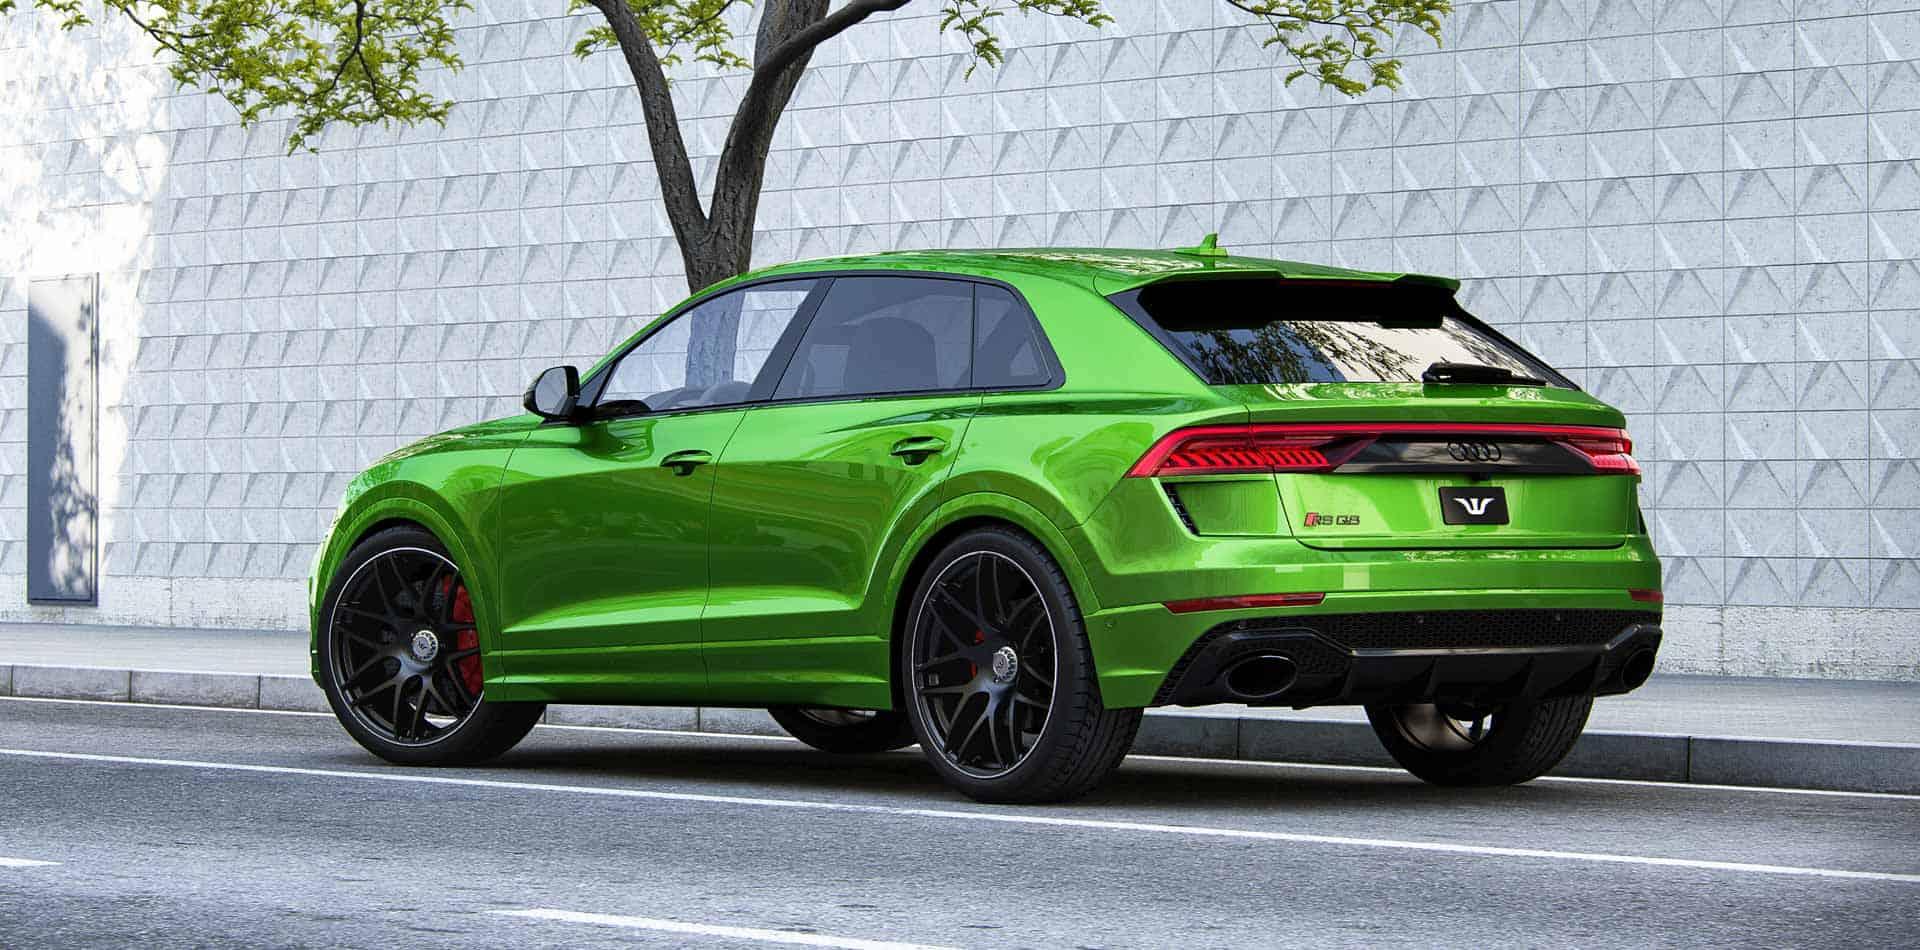 Audi-RS-Q8-by-Wheelsandmore-5